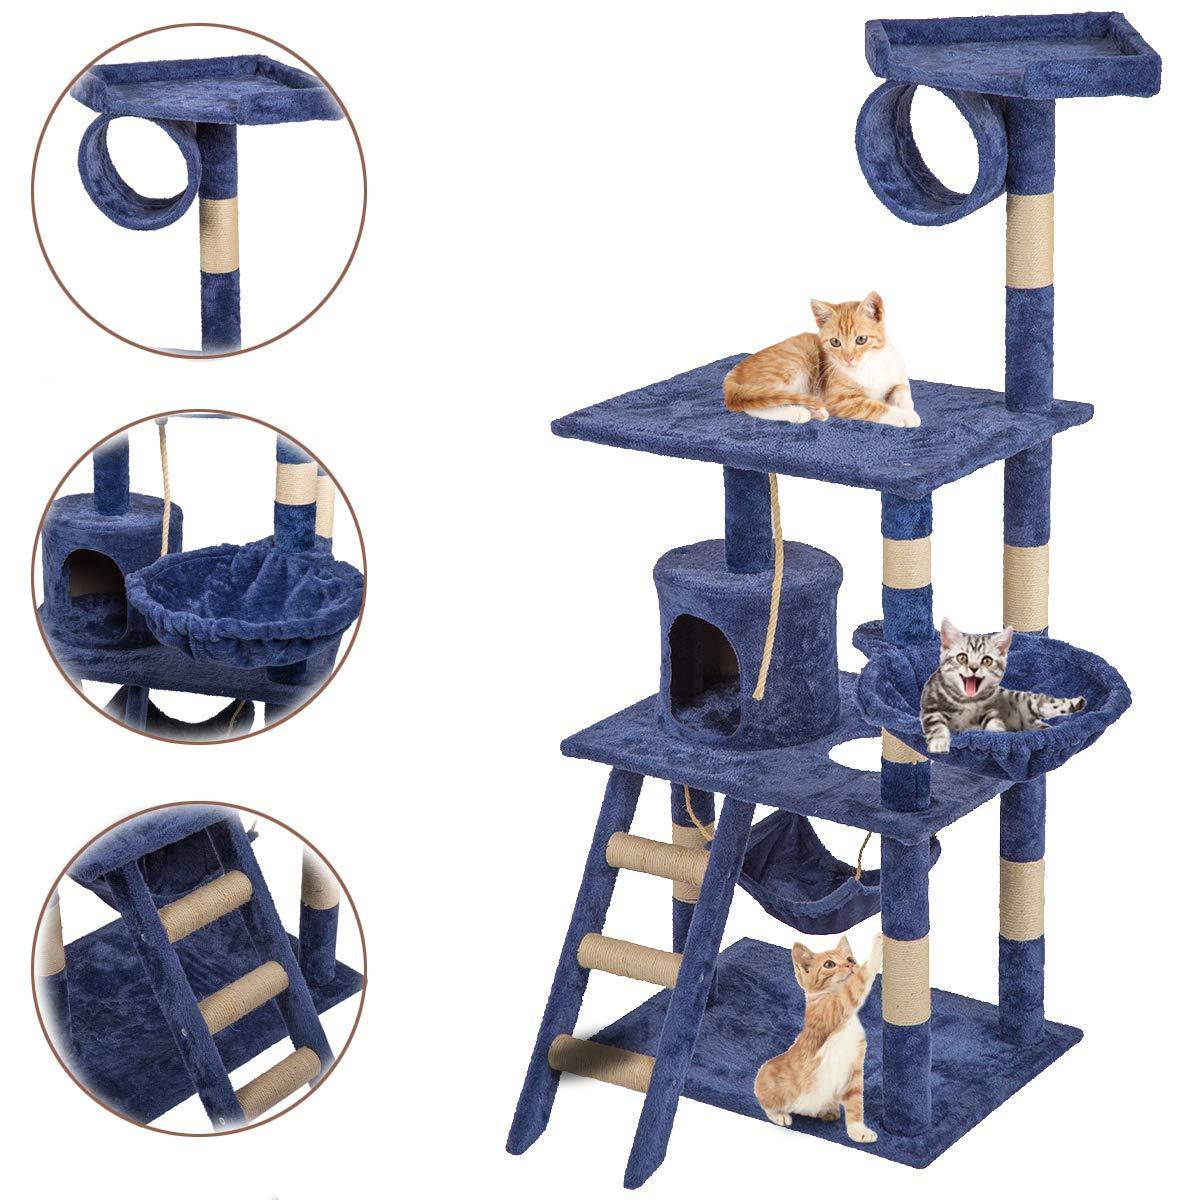 BestPet 64'' Cat Tree Tower Condo Furniture Scratch Post Kitty Pet House